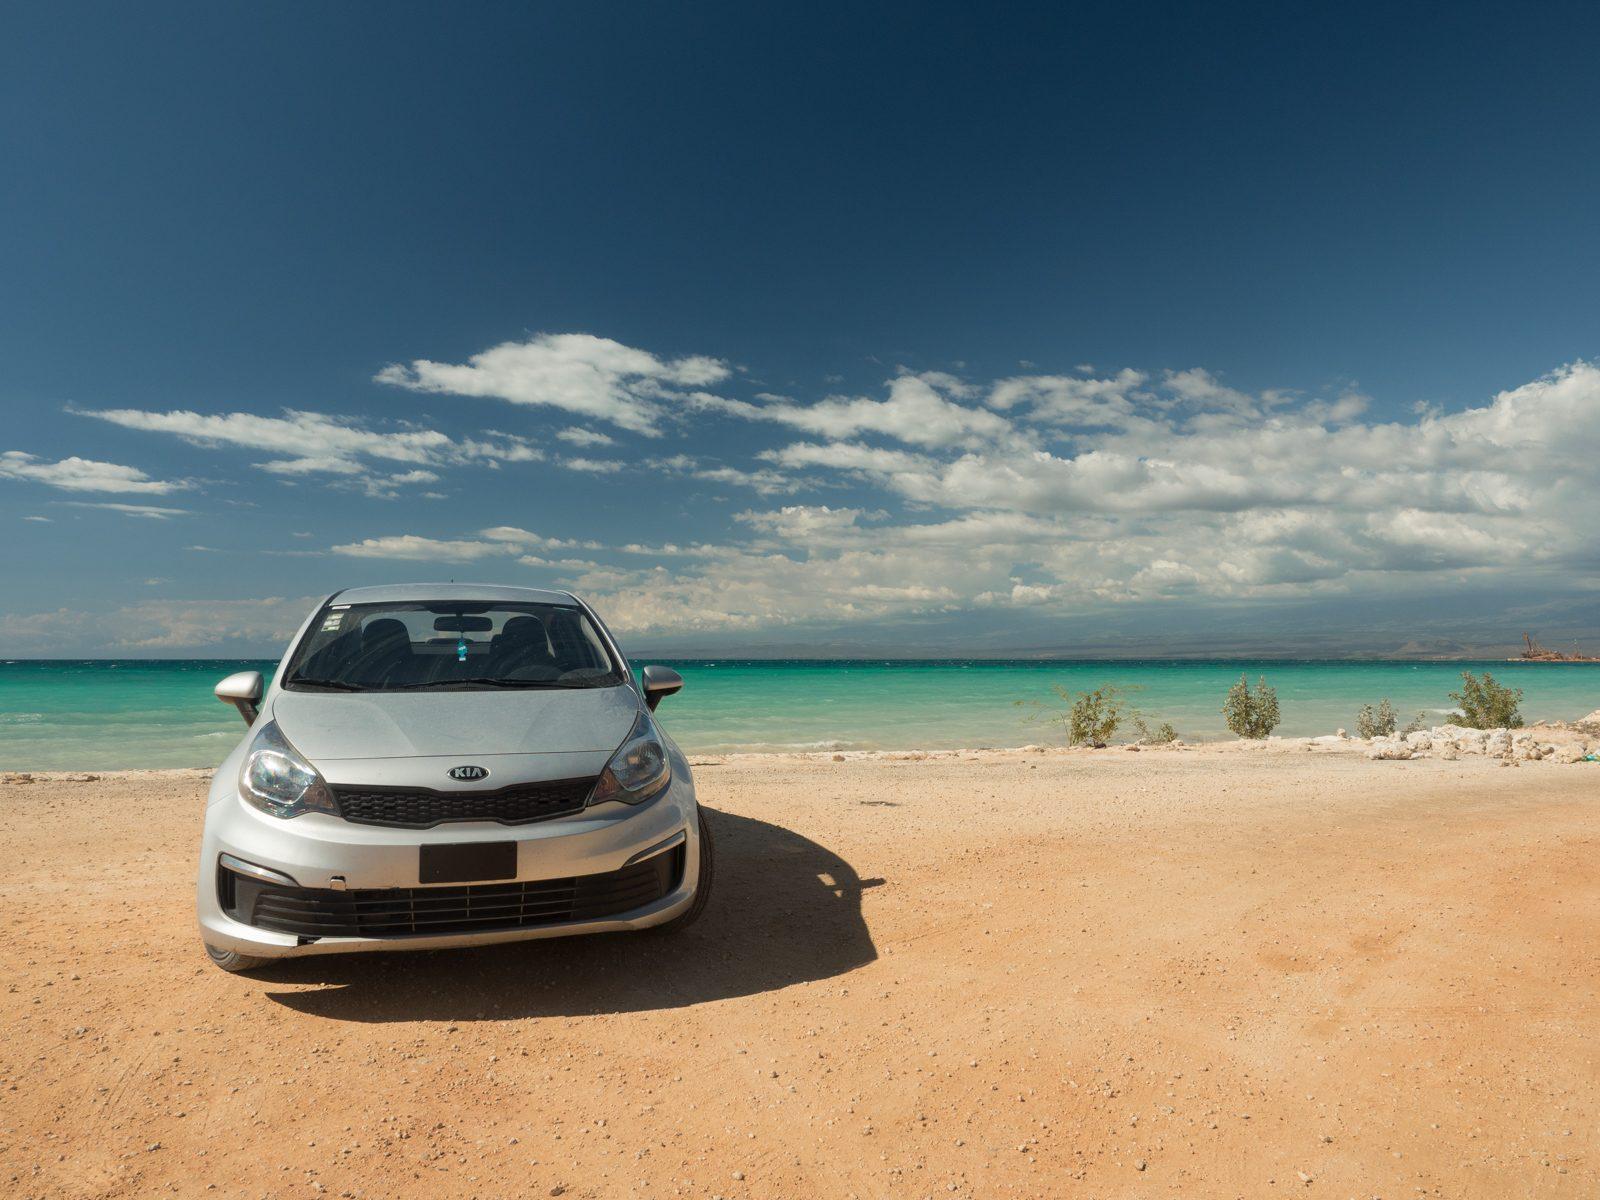 Guía para conducir coche en República Dominicana